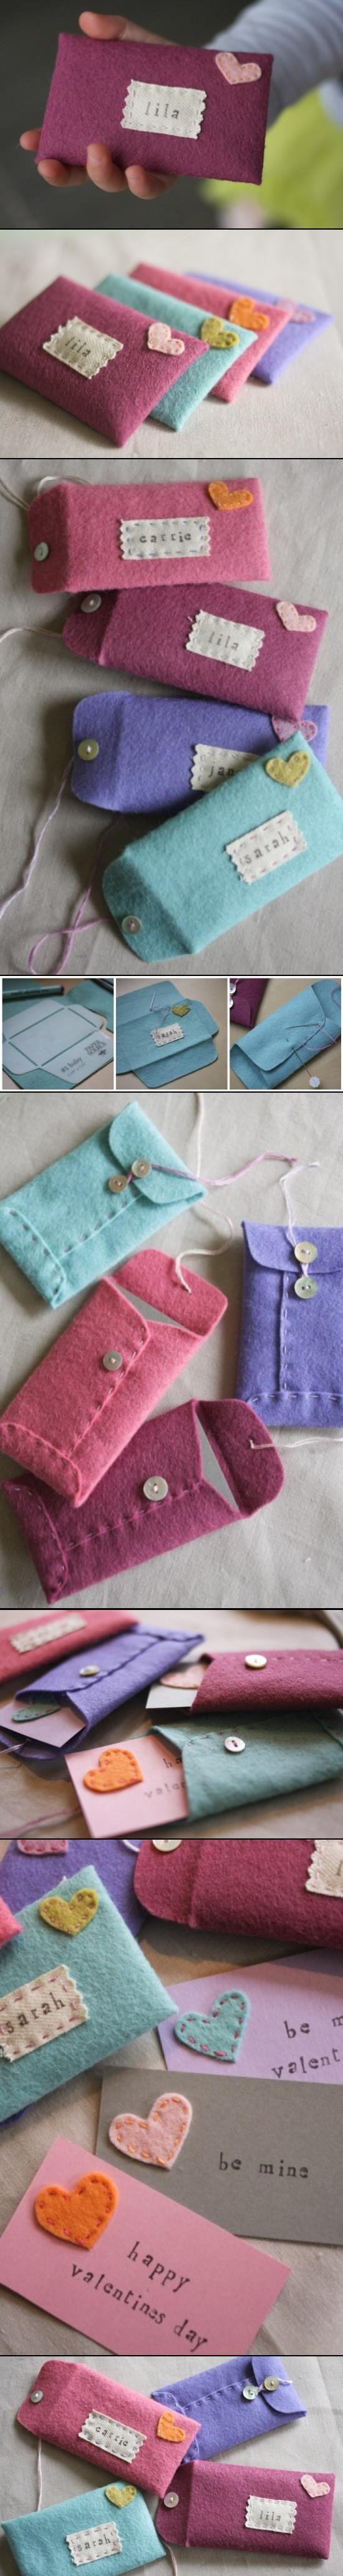 Embroidered Felt Envelopes #Embroidery #Embroider #Felt #Project #DIY #Envelope #Valentine #Indie #ColorBlock #Geometric #Pastel